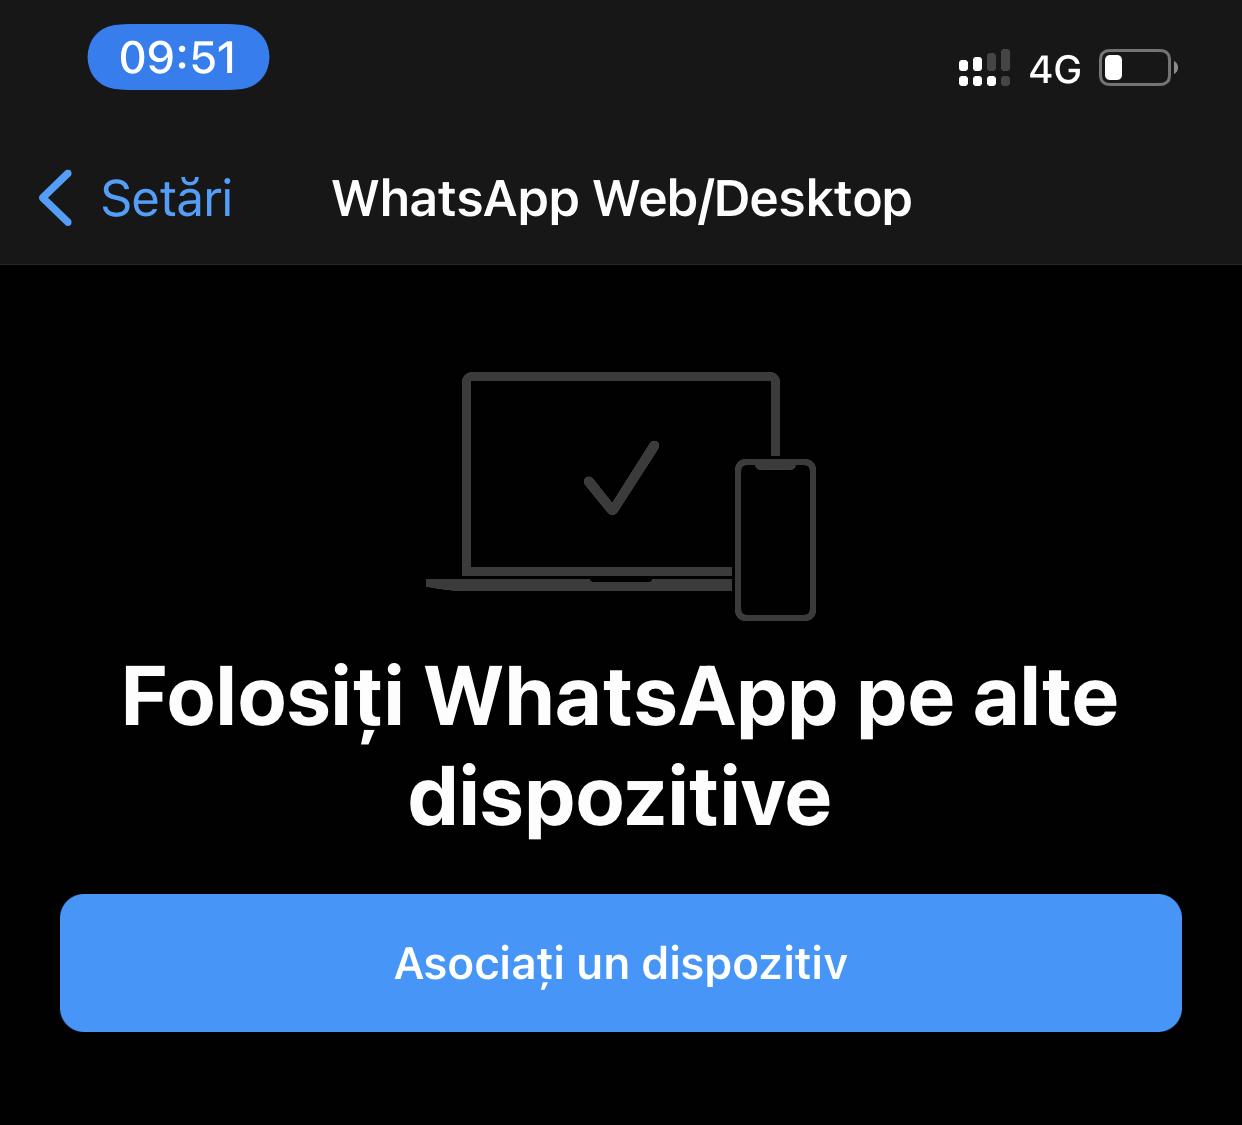 whatsapp website logare